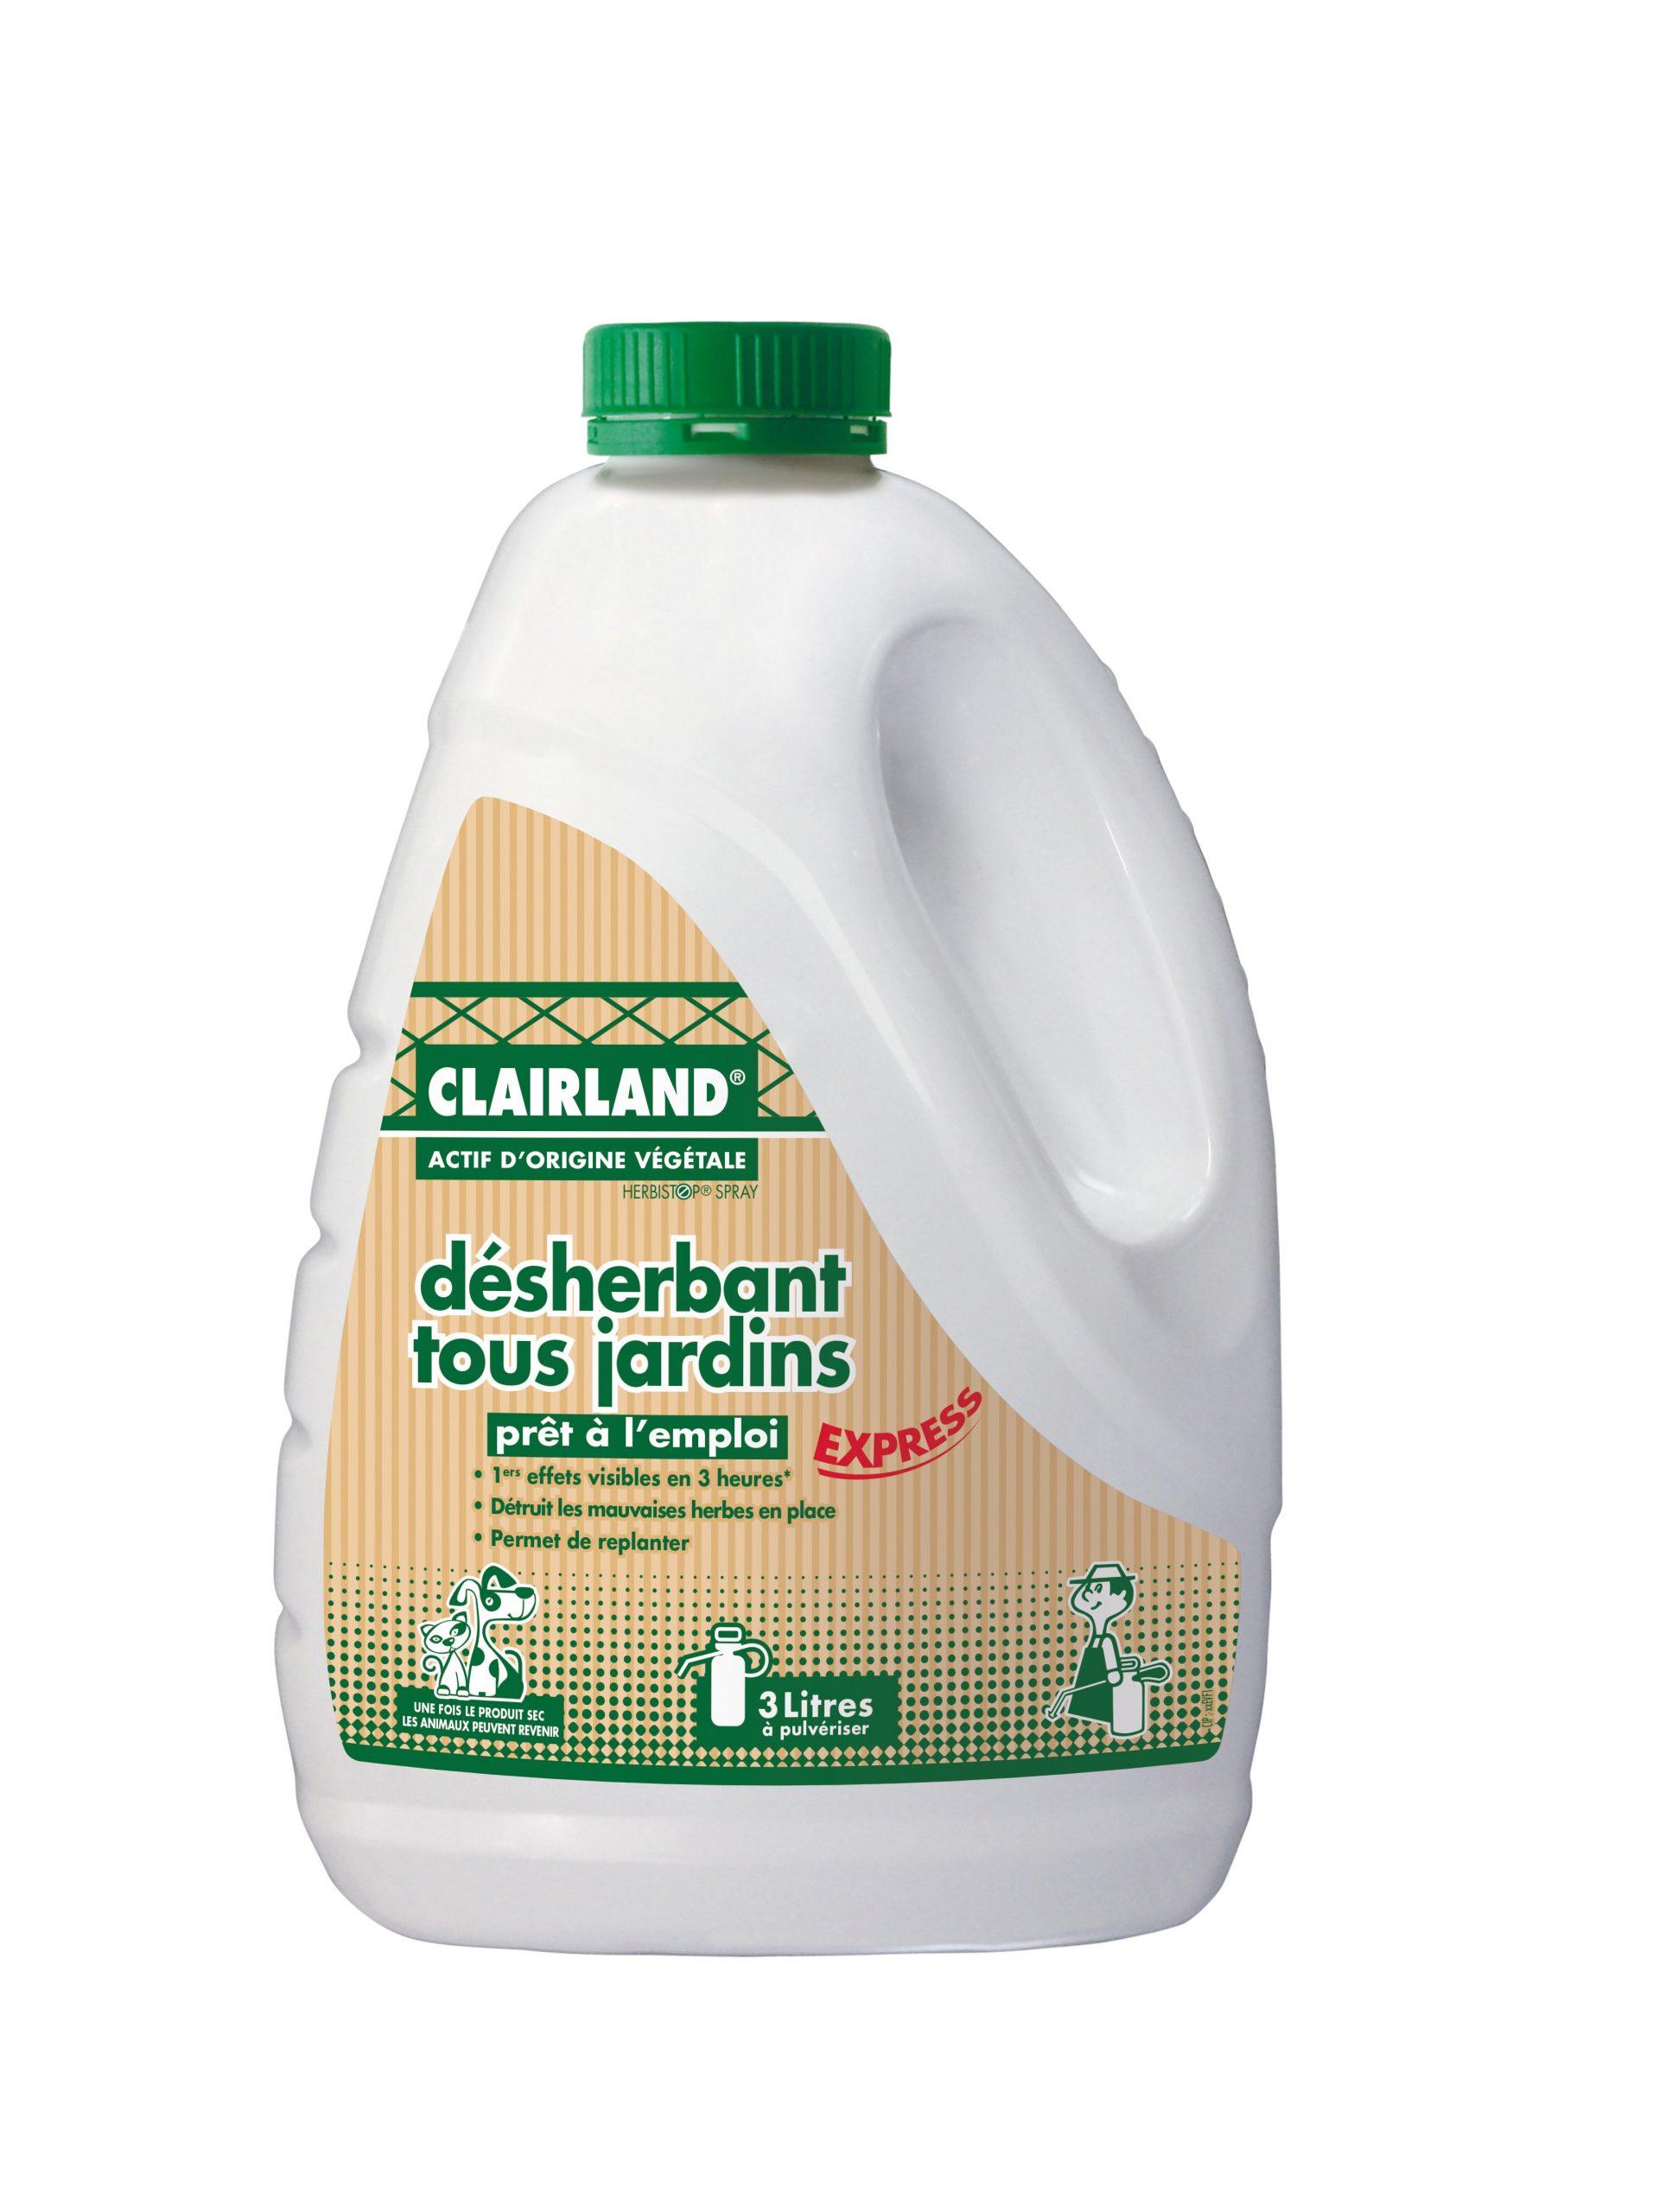 Désherbant Polyvalent Clairland 3 L pour Bayer Jardin Desherbant Gazon